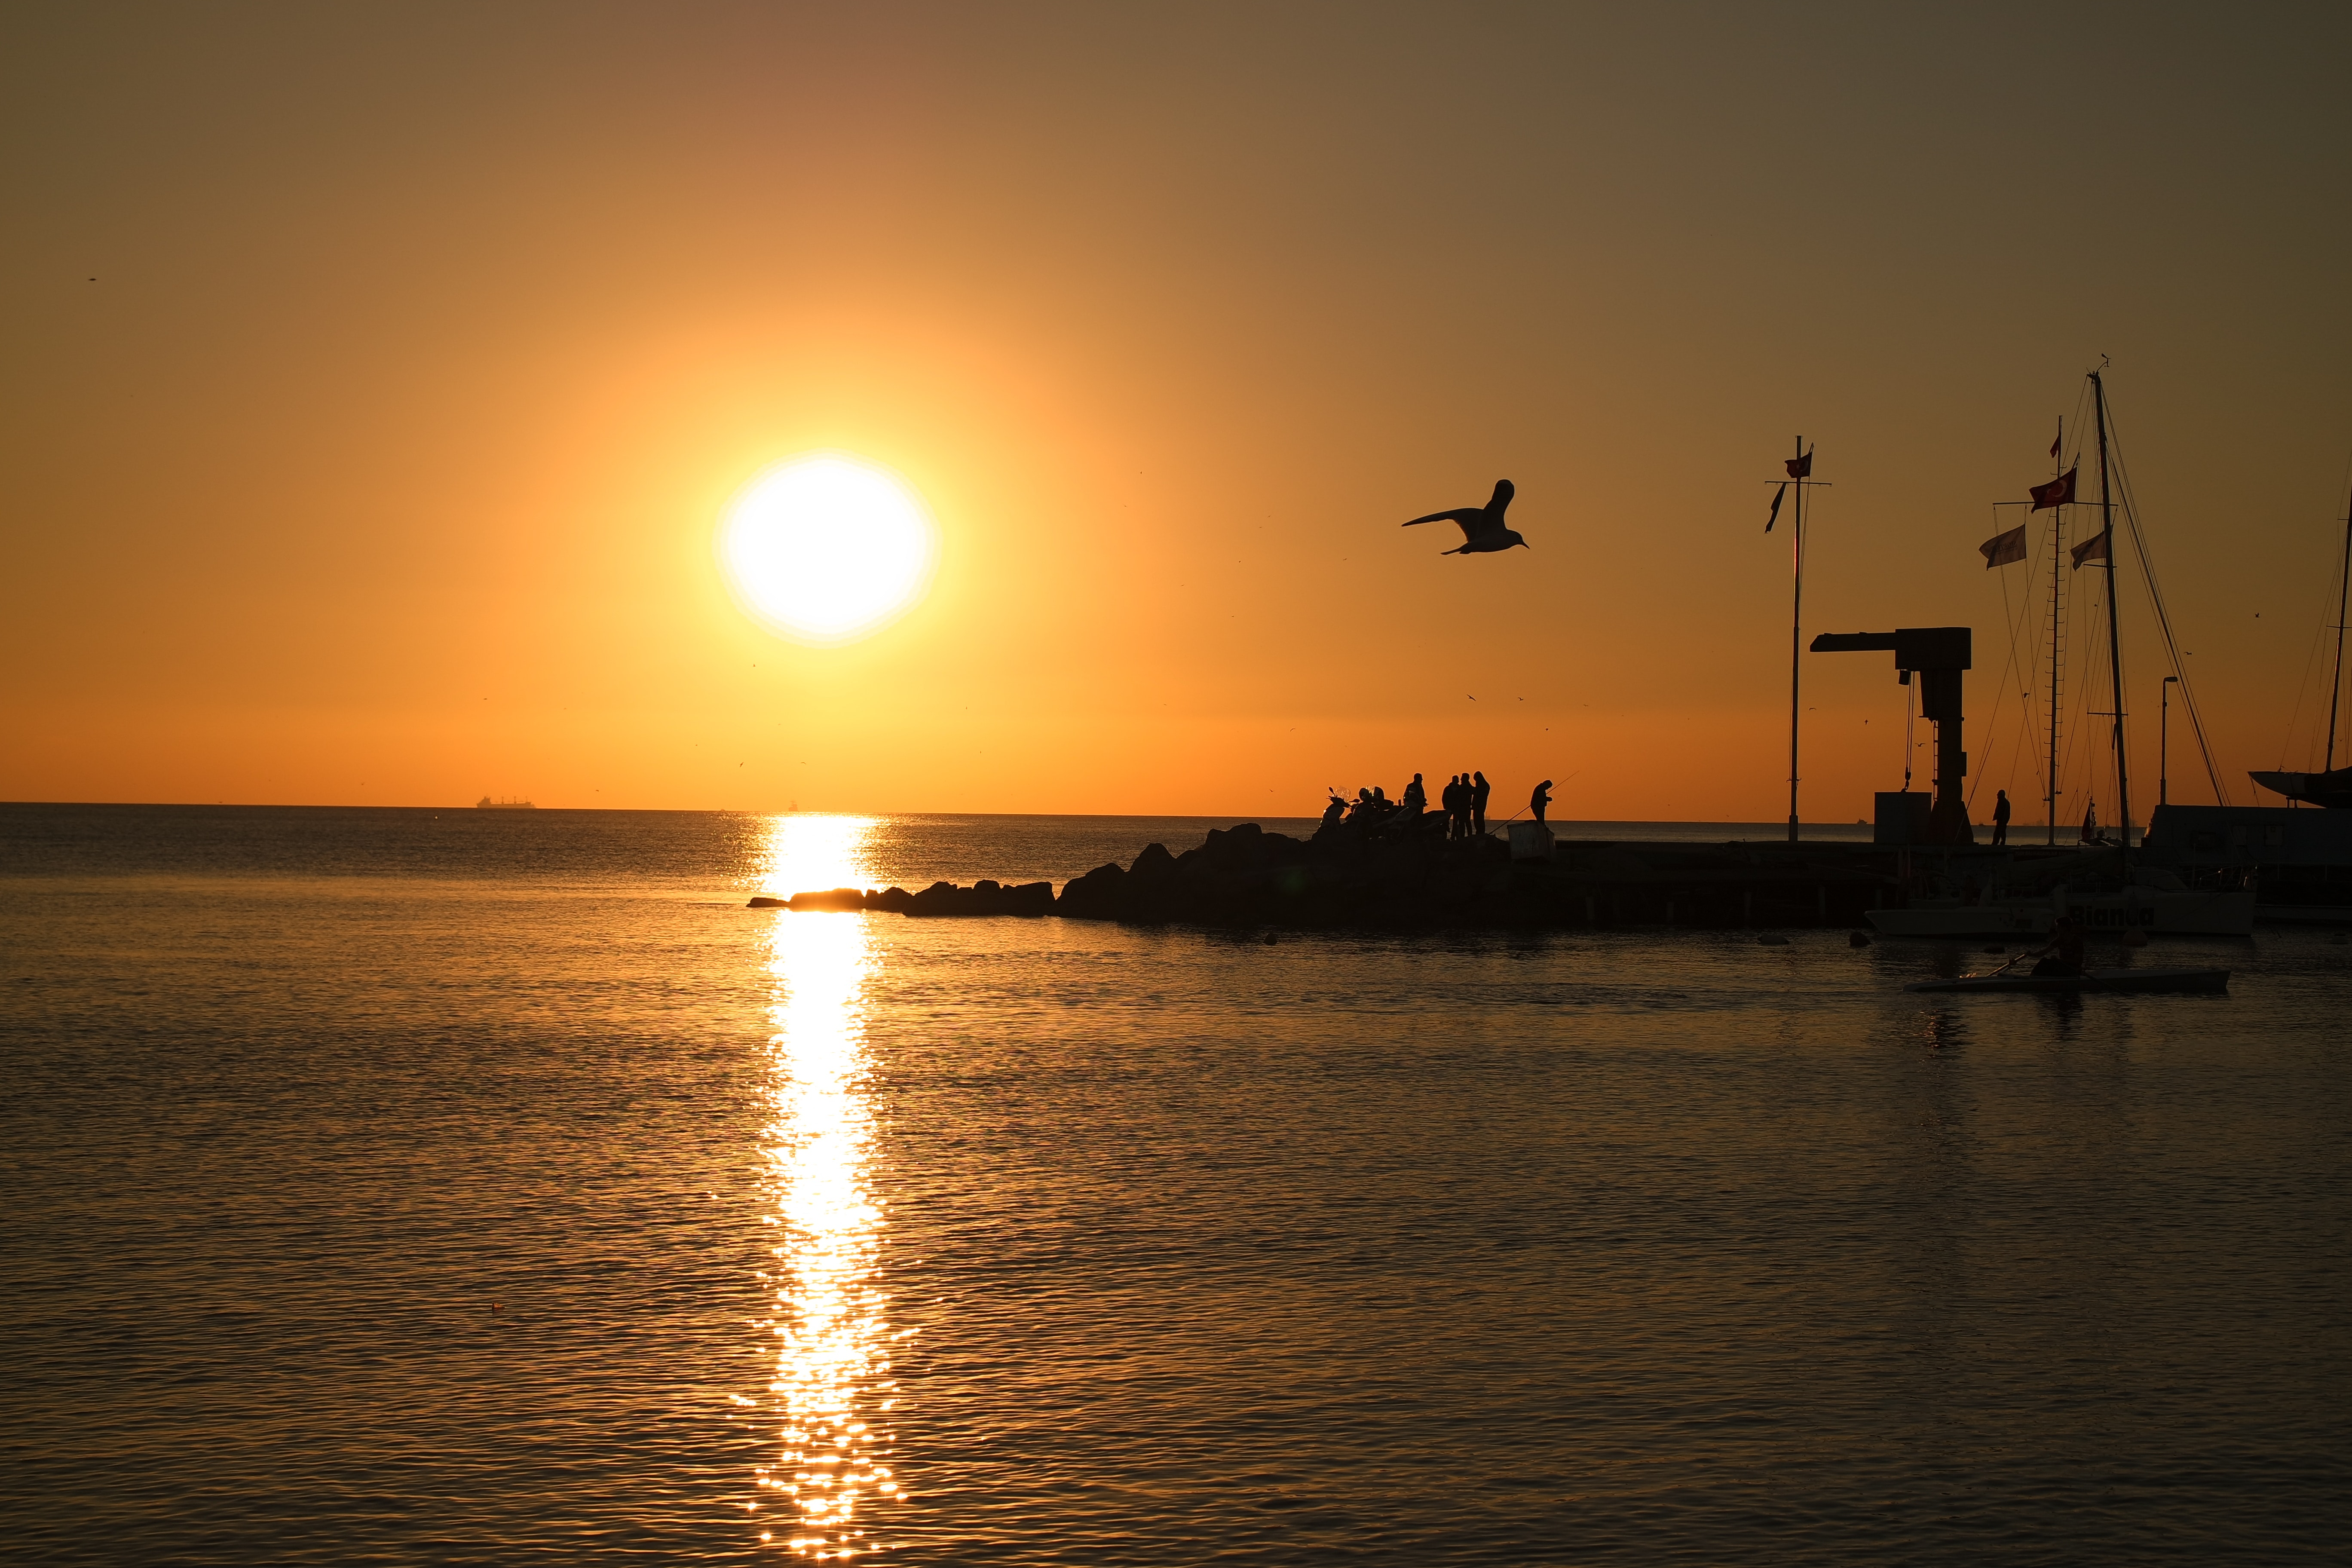 Silhouette of Bird Near Body of Water during Sunset, Birds, Boats, Evening sun, Pier, HQ Photo